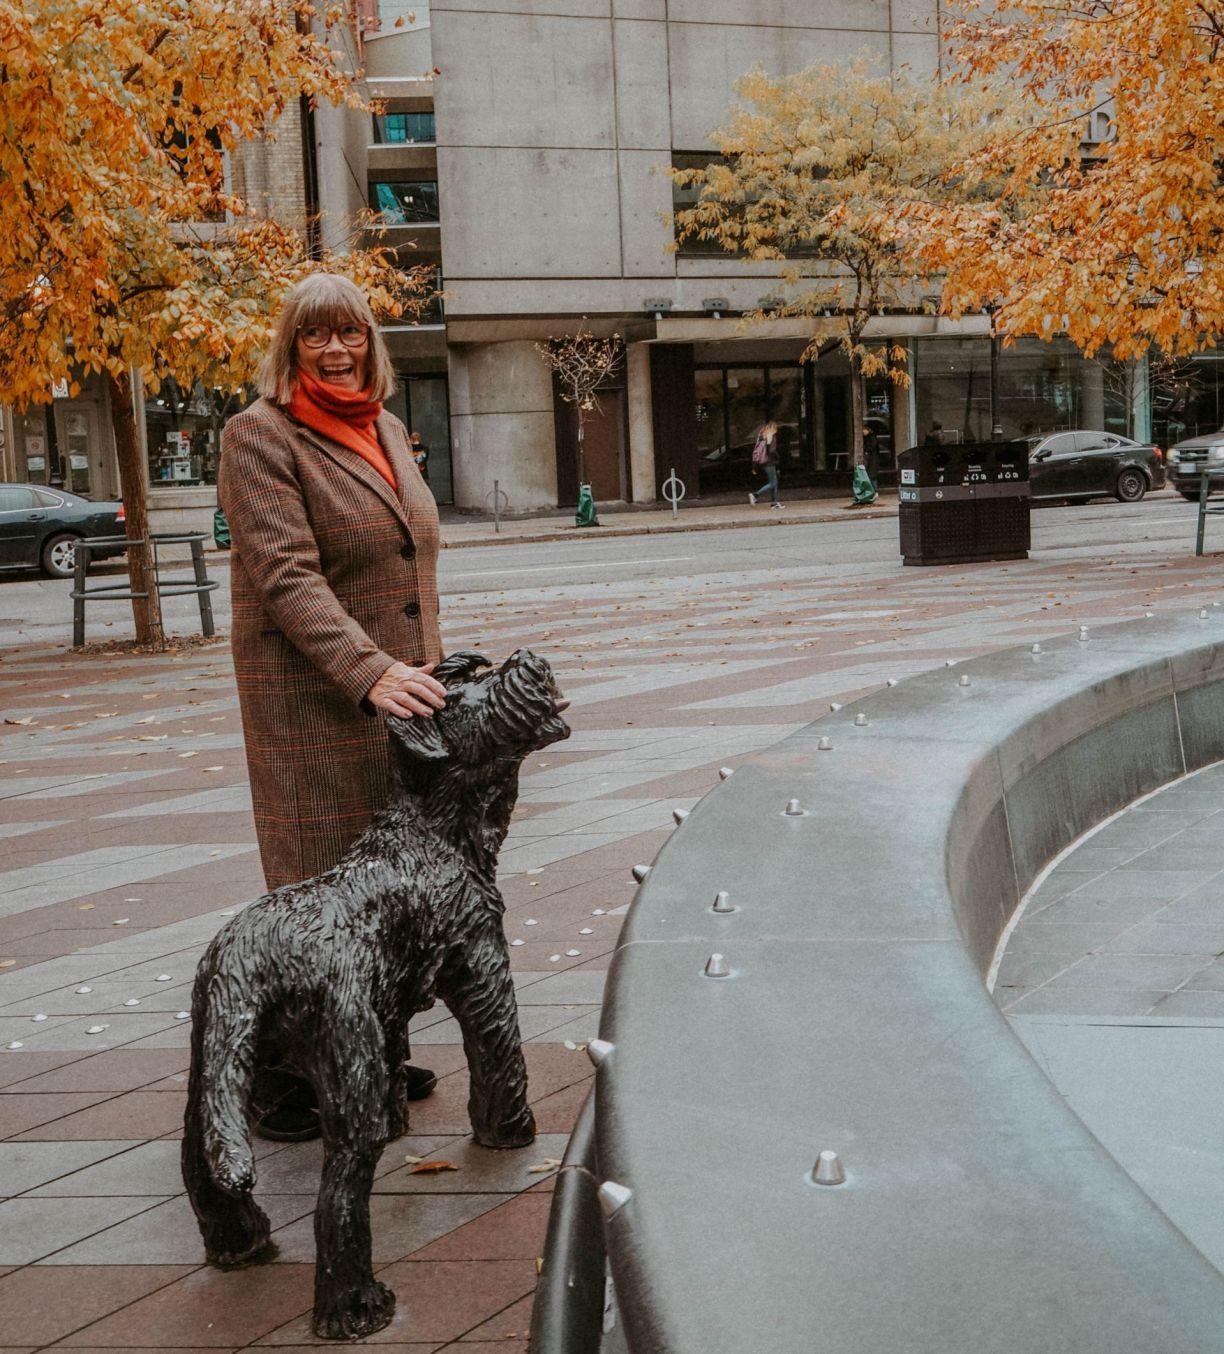 Kate Winney Toronto Travel guide